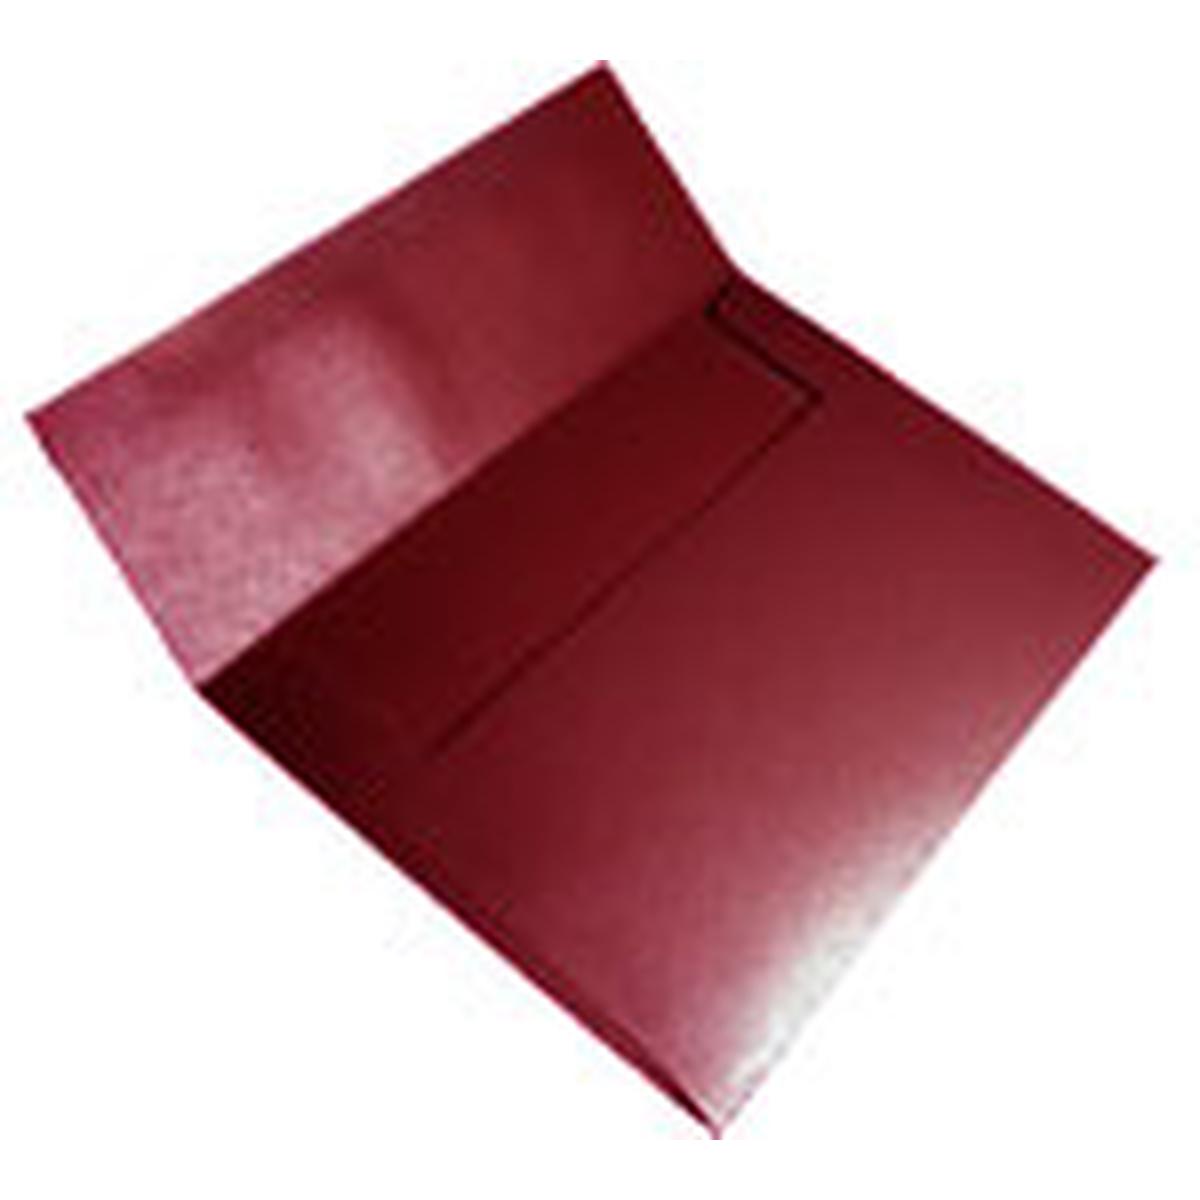 Cherish Paperie: Wedding Programs, Envelopments, Wedding Invitations ...